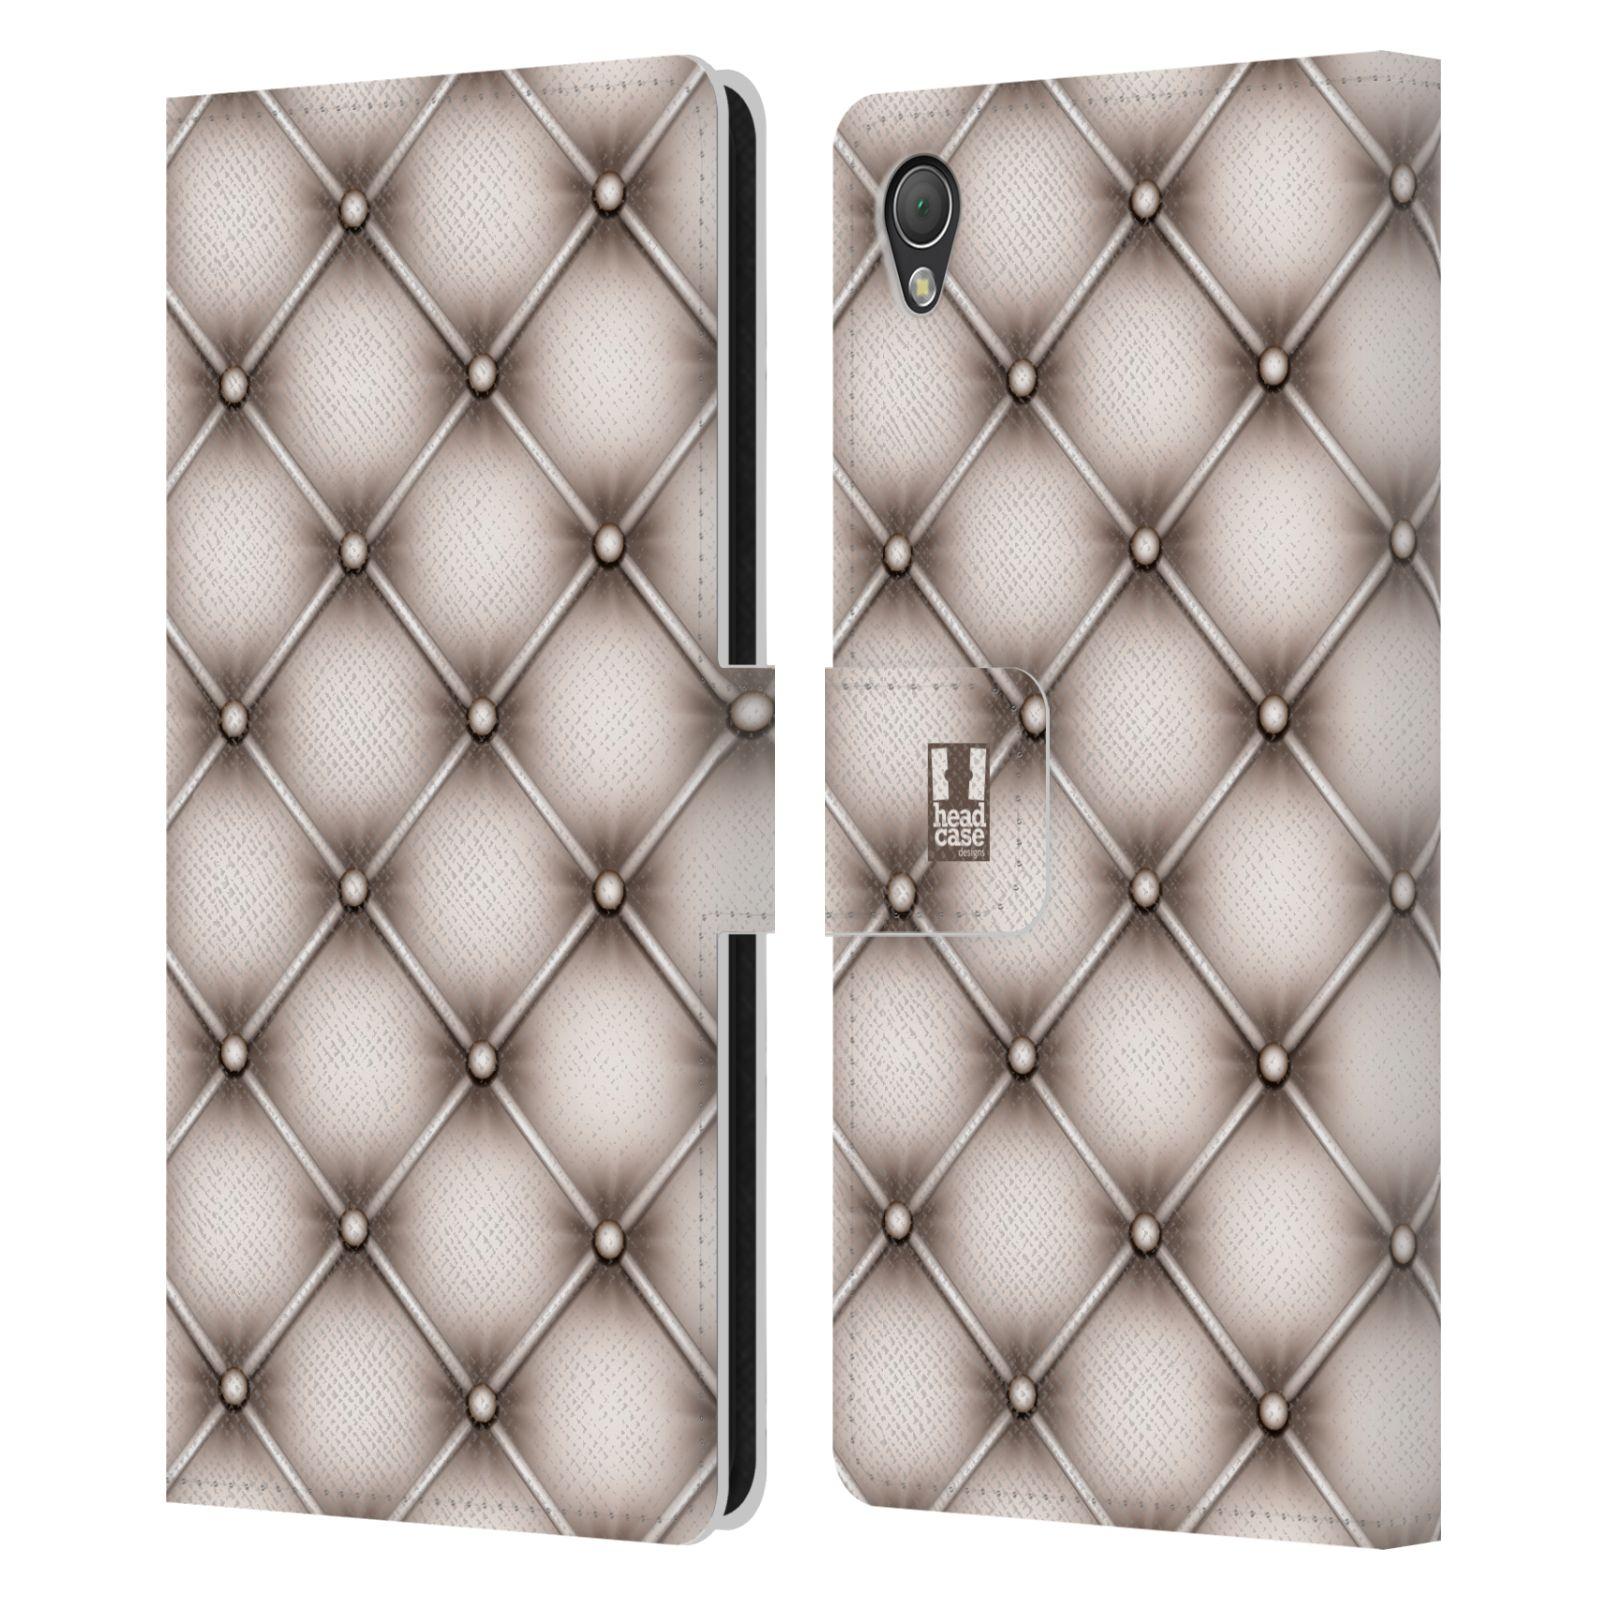 head case kissen brieftasche handyh lle aus leder f r sony phones 1 ebay. Black Bedroom Furniture Sets. Home Design Ideas